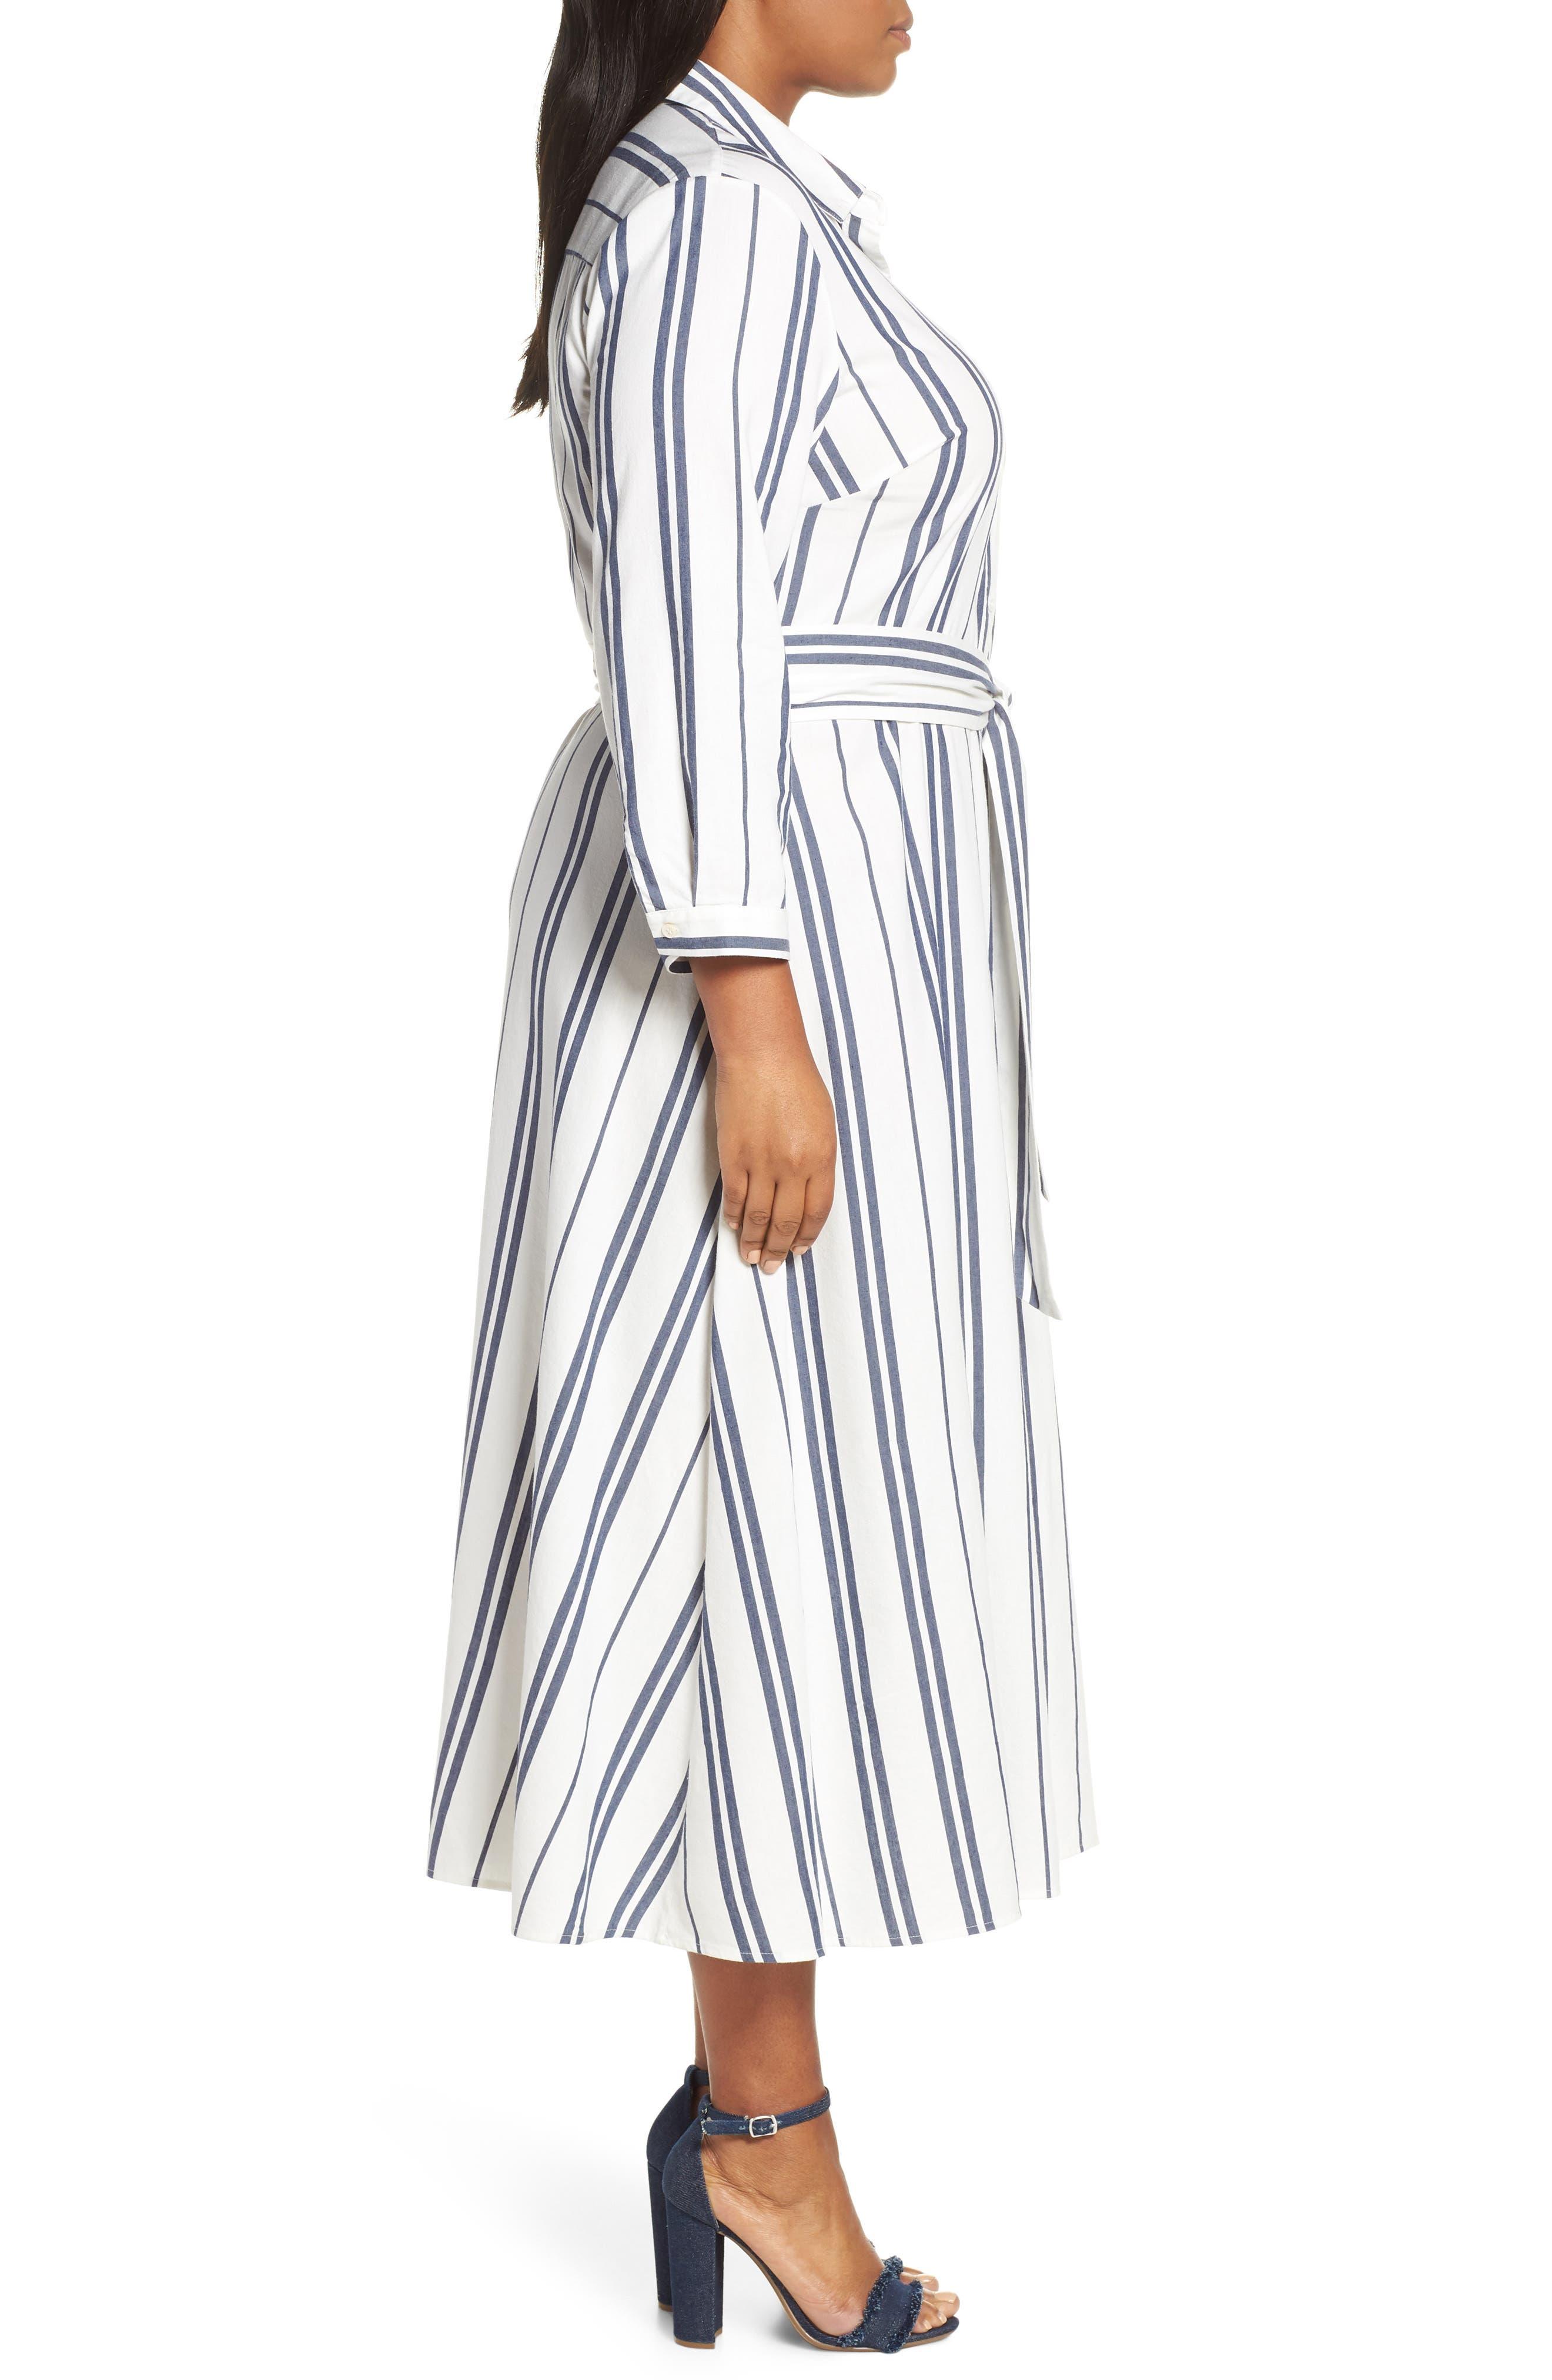 VINCE CAMUTO, Valiant Stripe Midi Shirtdress, Alternate thumbnail 4, color, PEARL IVORY